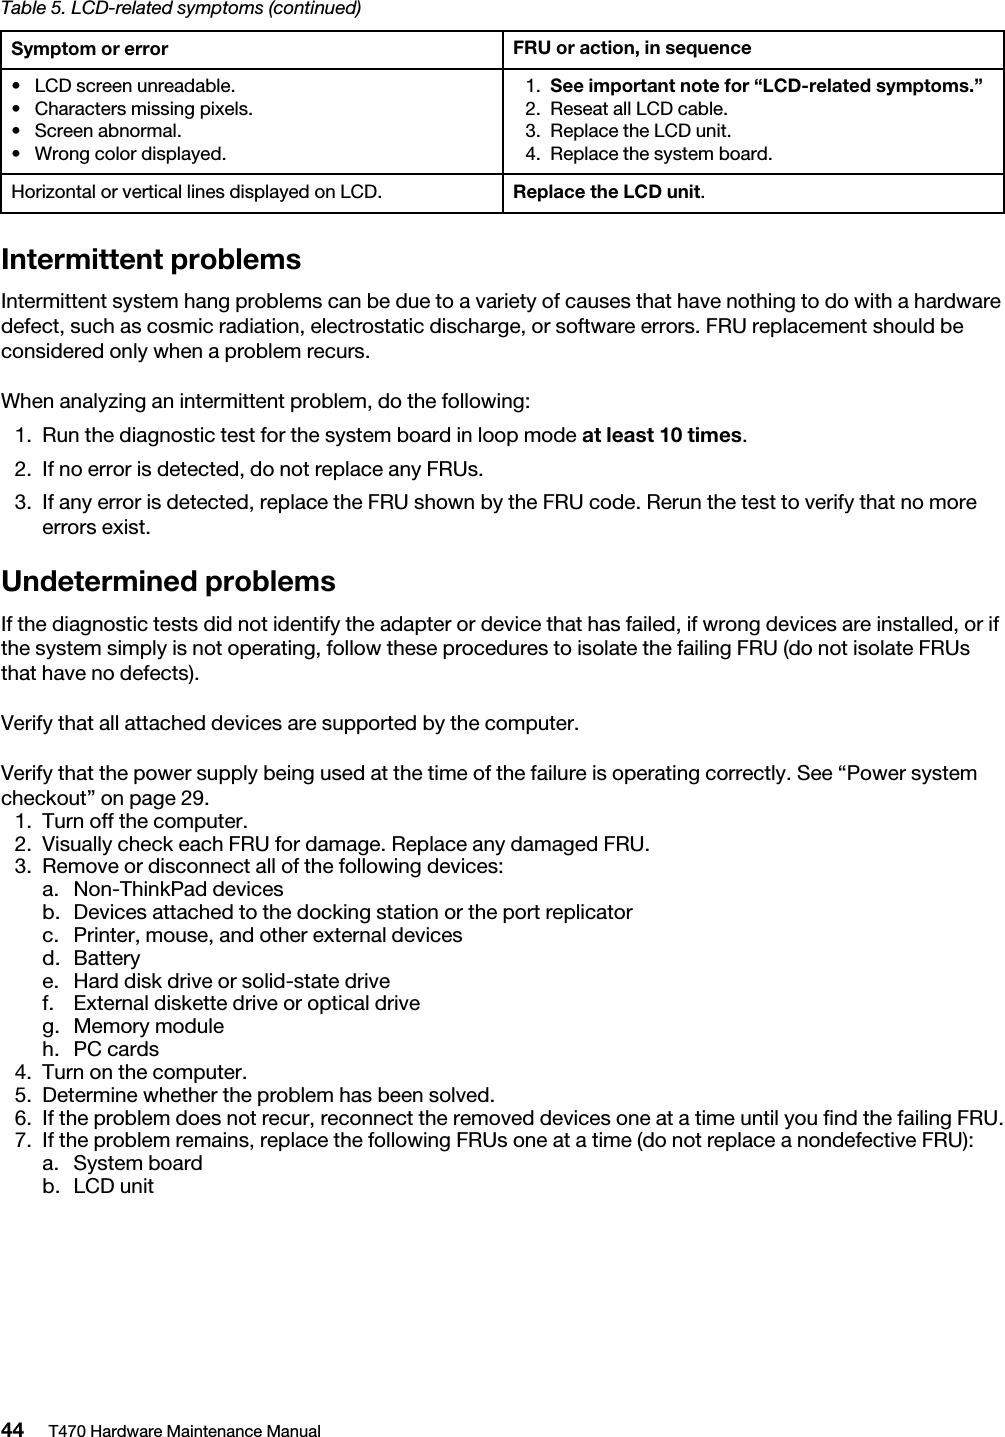 Lenovo T470 Hmm En Sp40M11890 03 Hardware Maintenance Manual